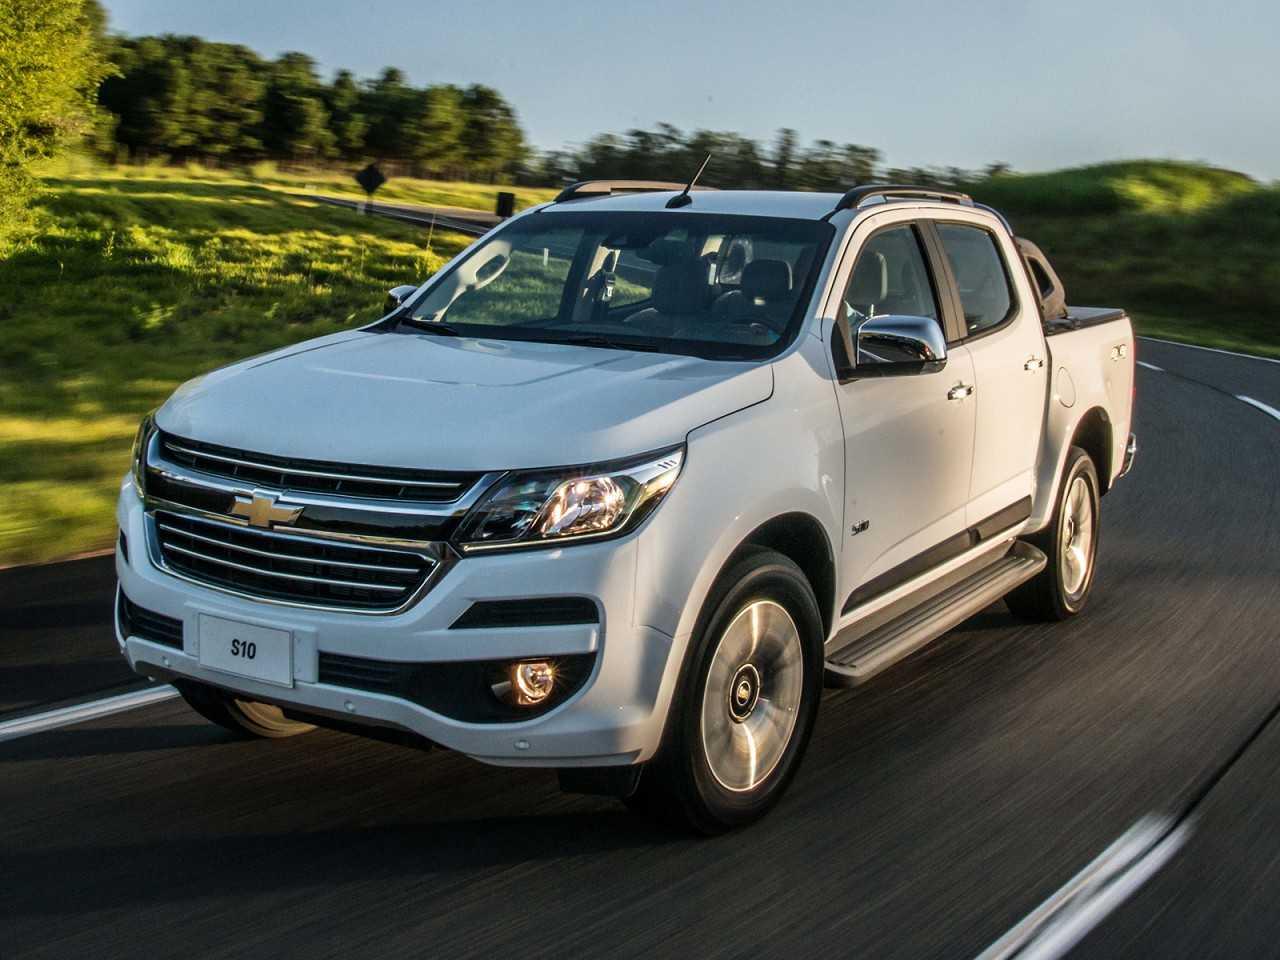 ChevroletS10 2018 - ângulo frontal